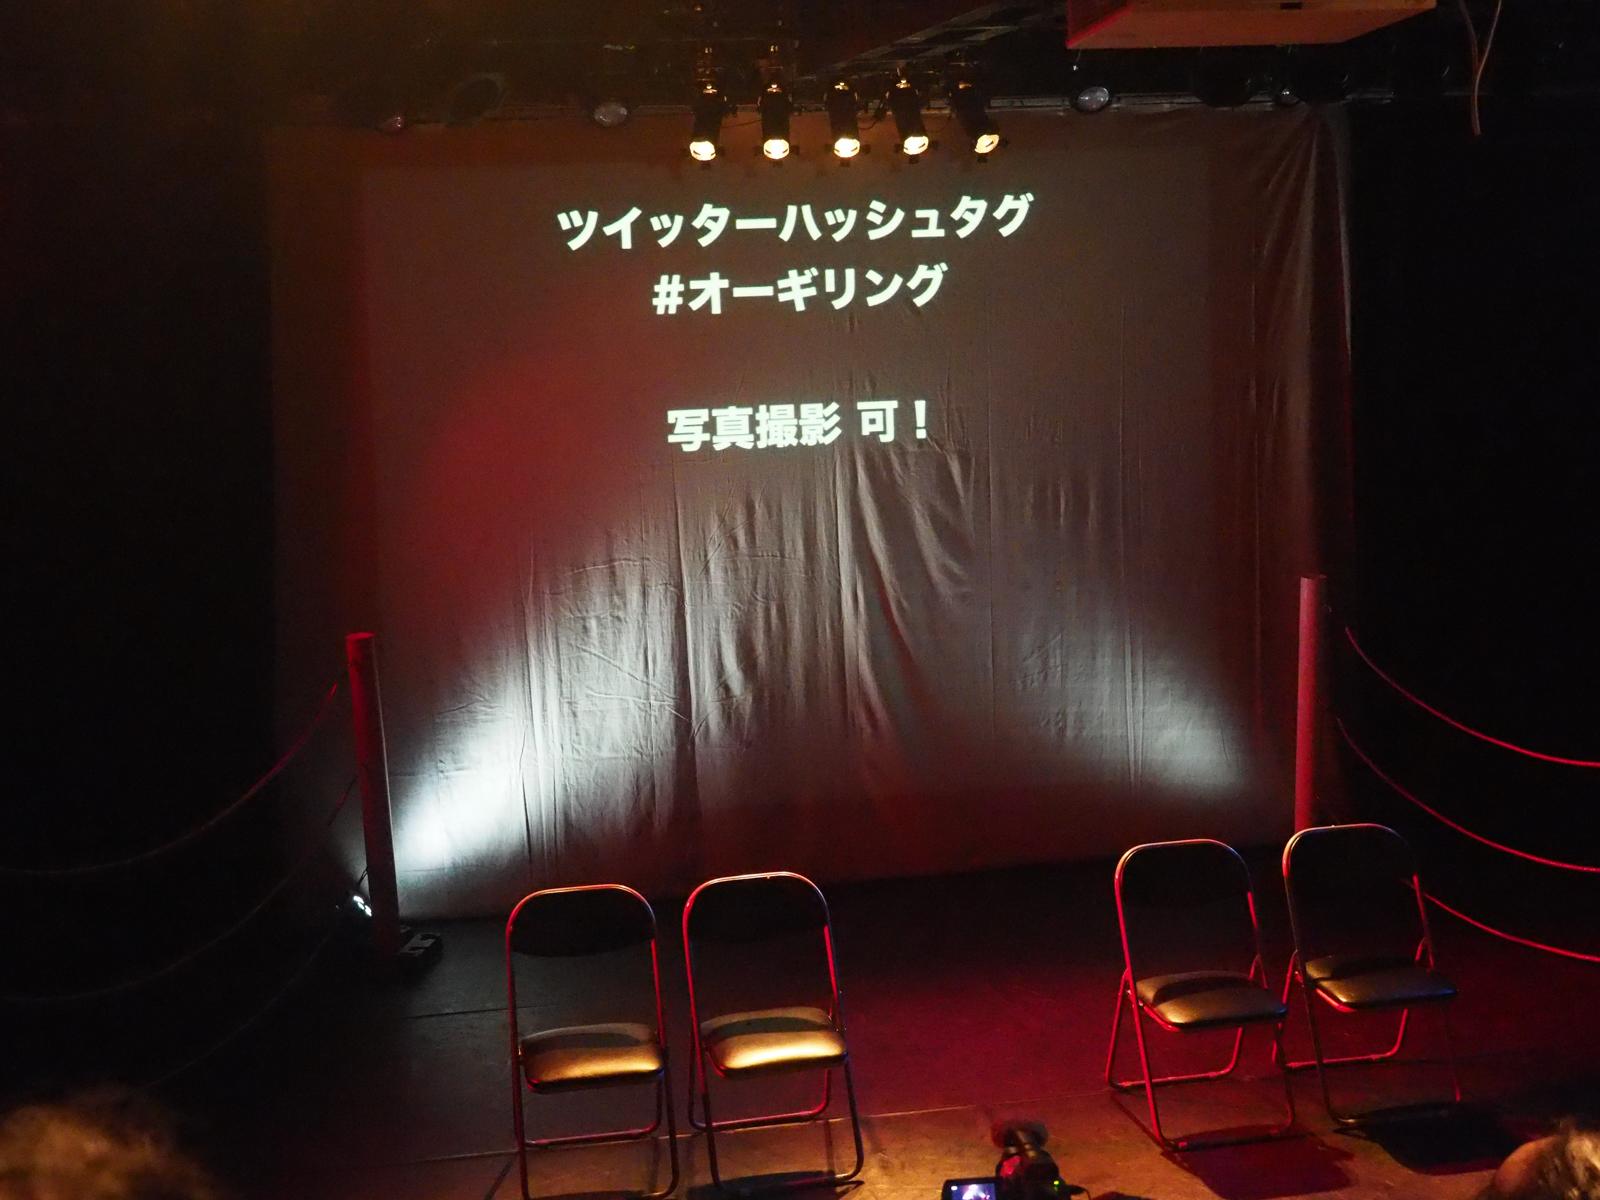 f:id:motomachi24:20170902185034j:plain